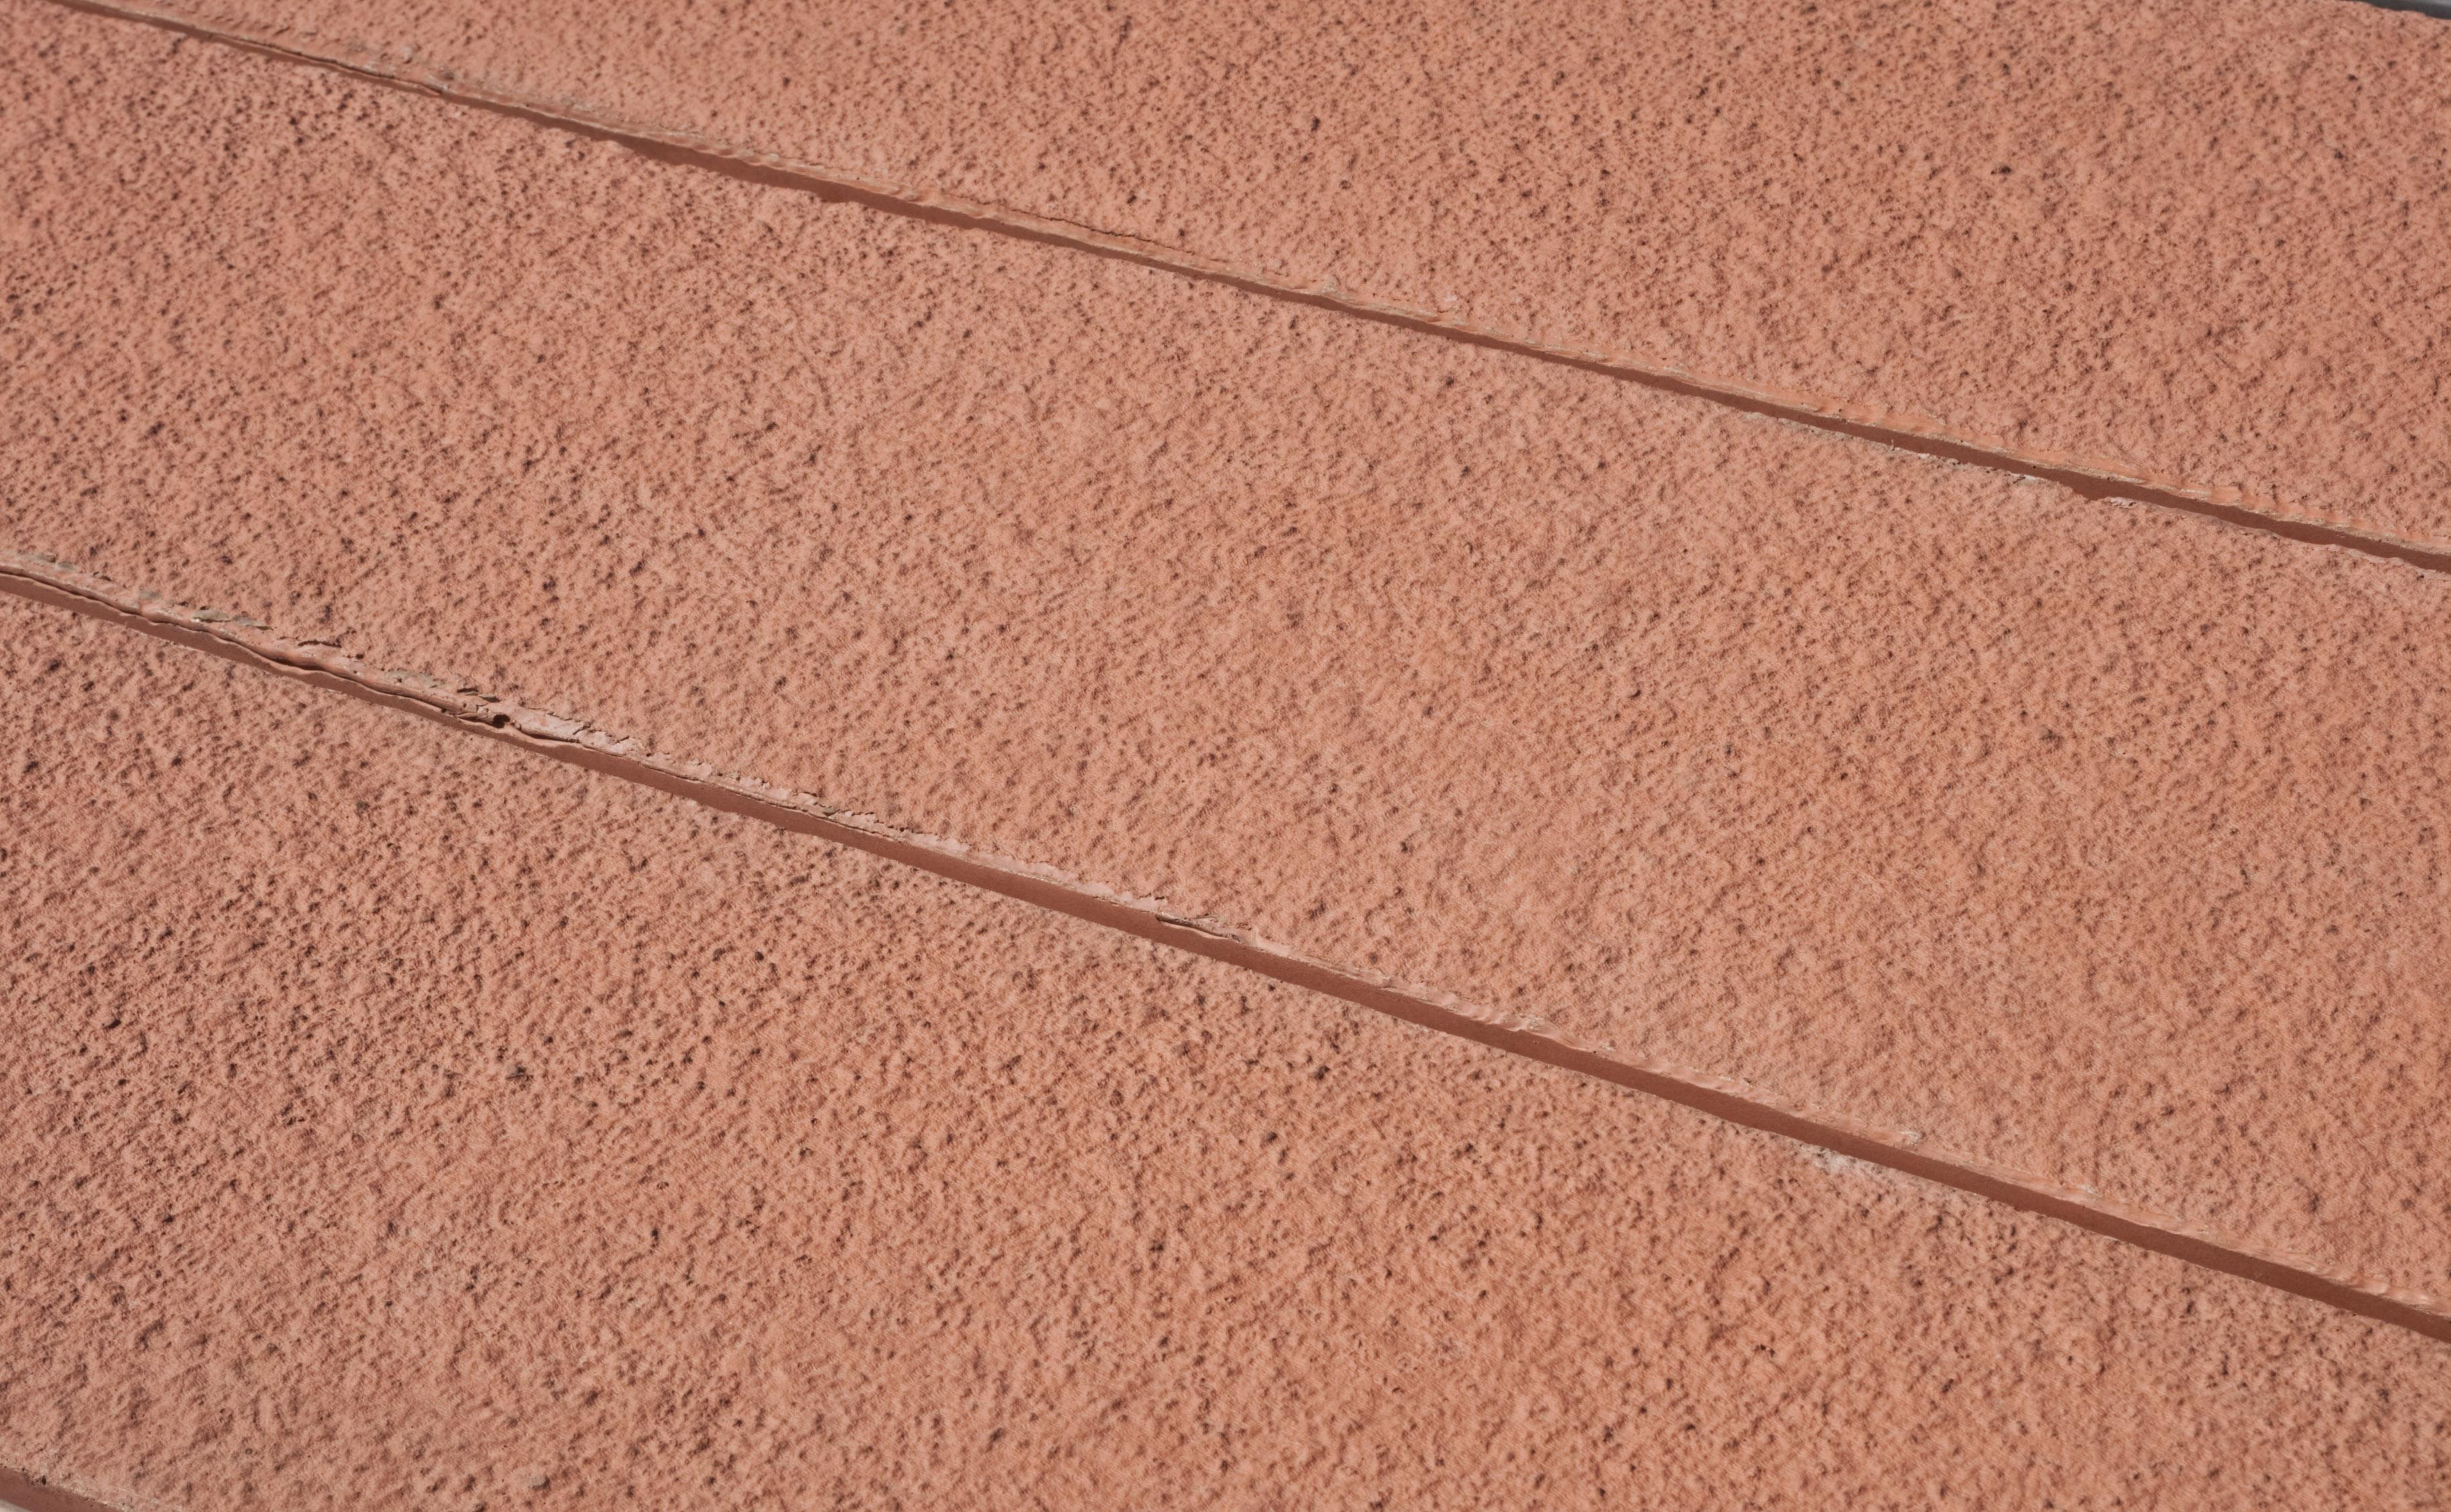 PermaTrak Sandblast Texture